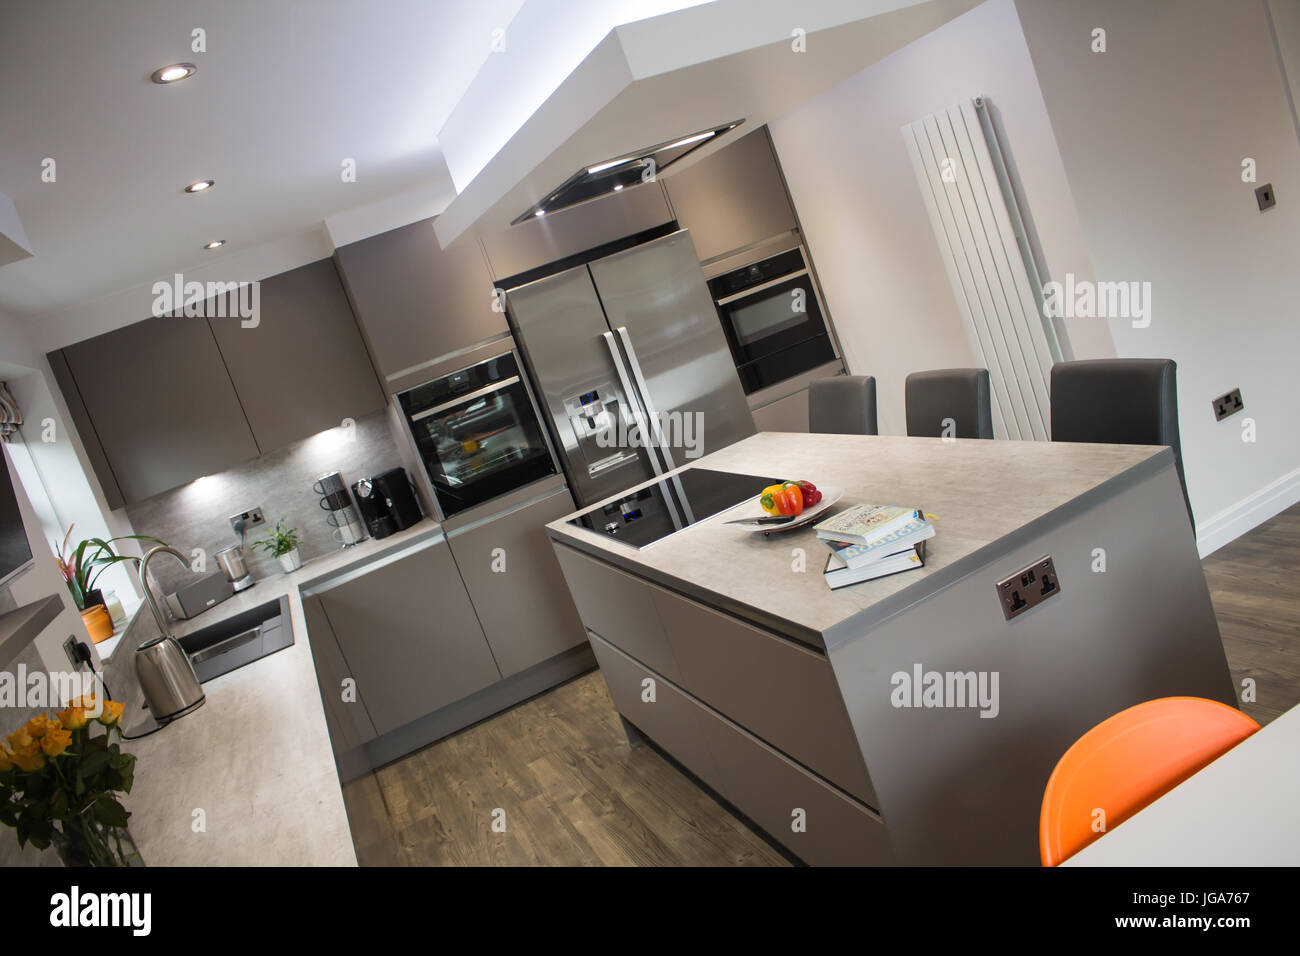 Un moderno grigio opaco cucina interno che mostra un centro isola